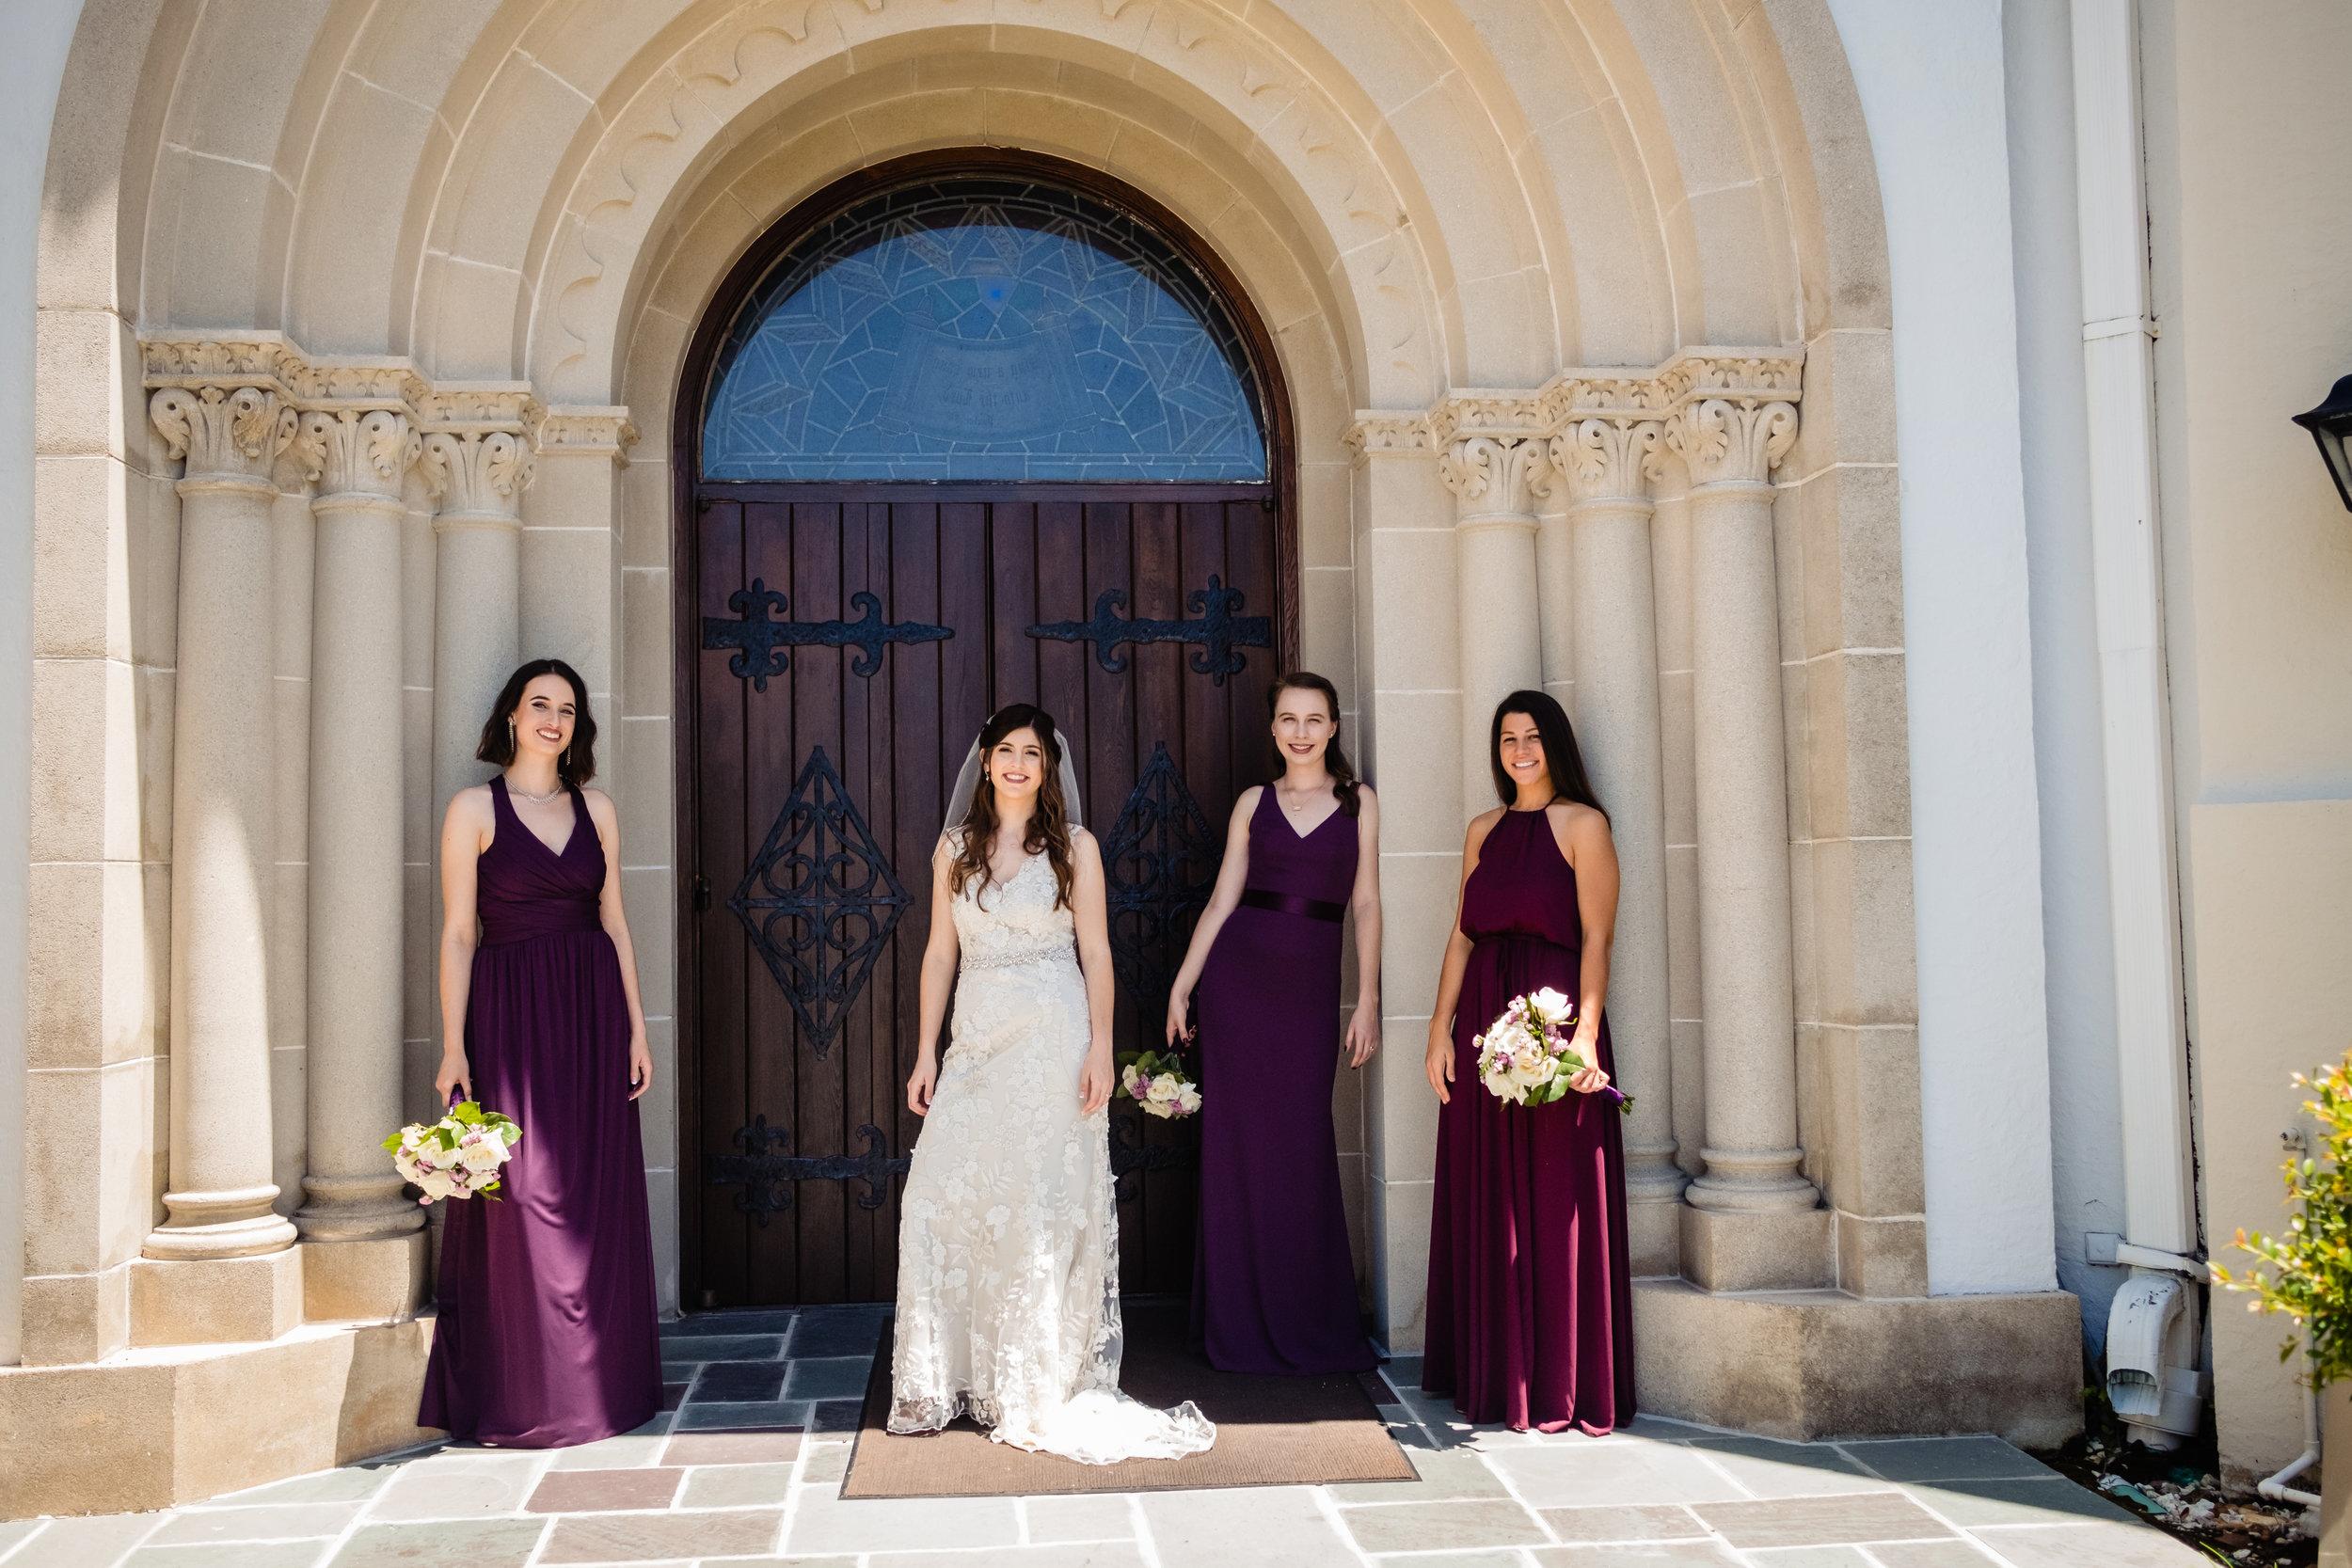 HAH_Zoe and Daniel_Clearwater Wedding_325_2018.jpg